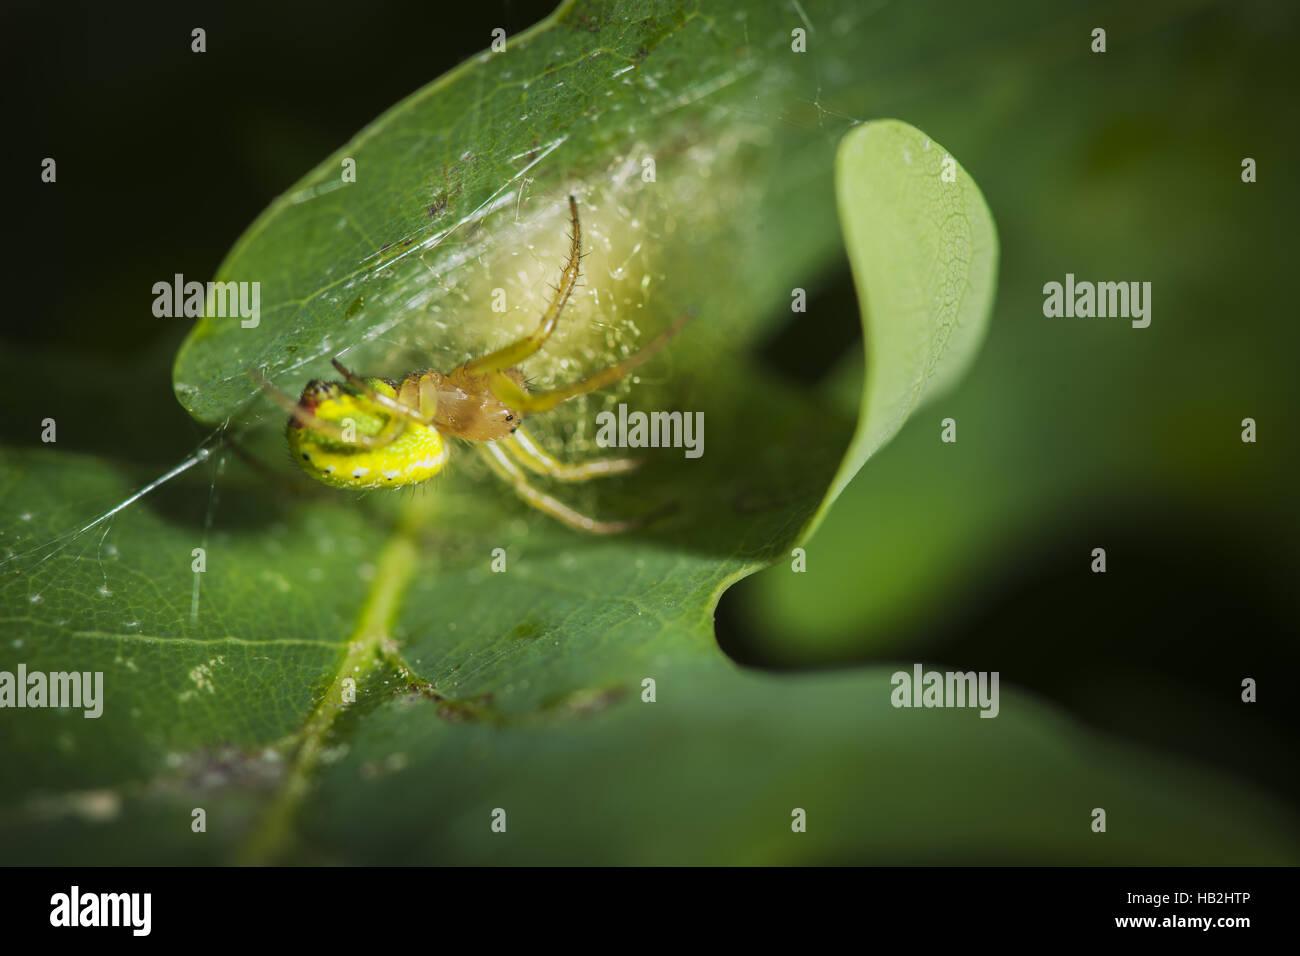 Araniella cucurbitina on leaf - Stock Image